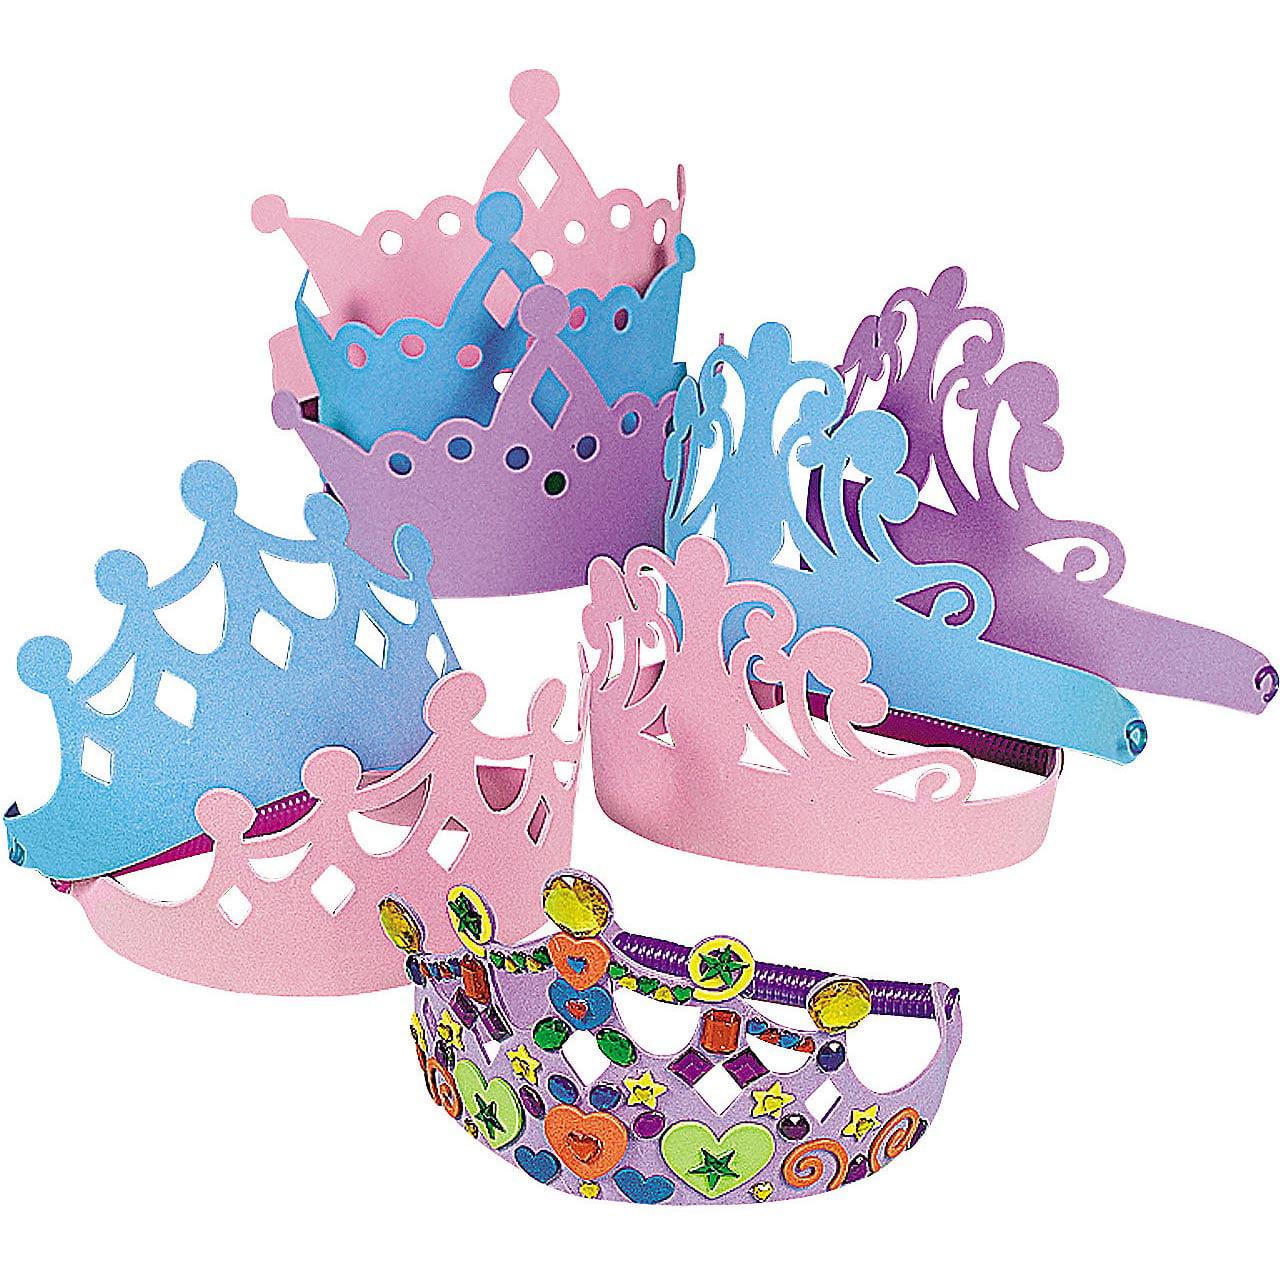 12 Foam Princess Tiara Assortment Girls Party Favors Decorate Your Own